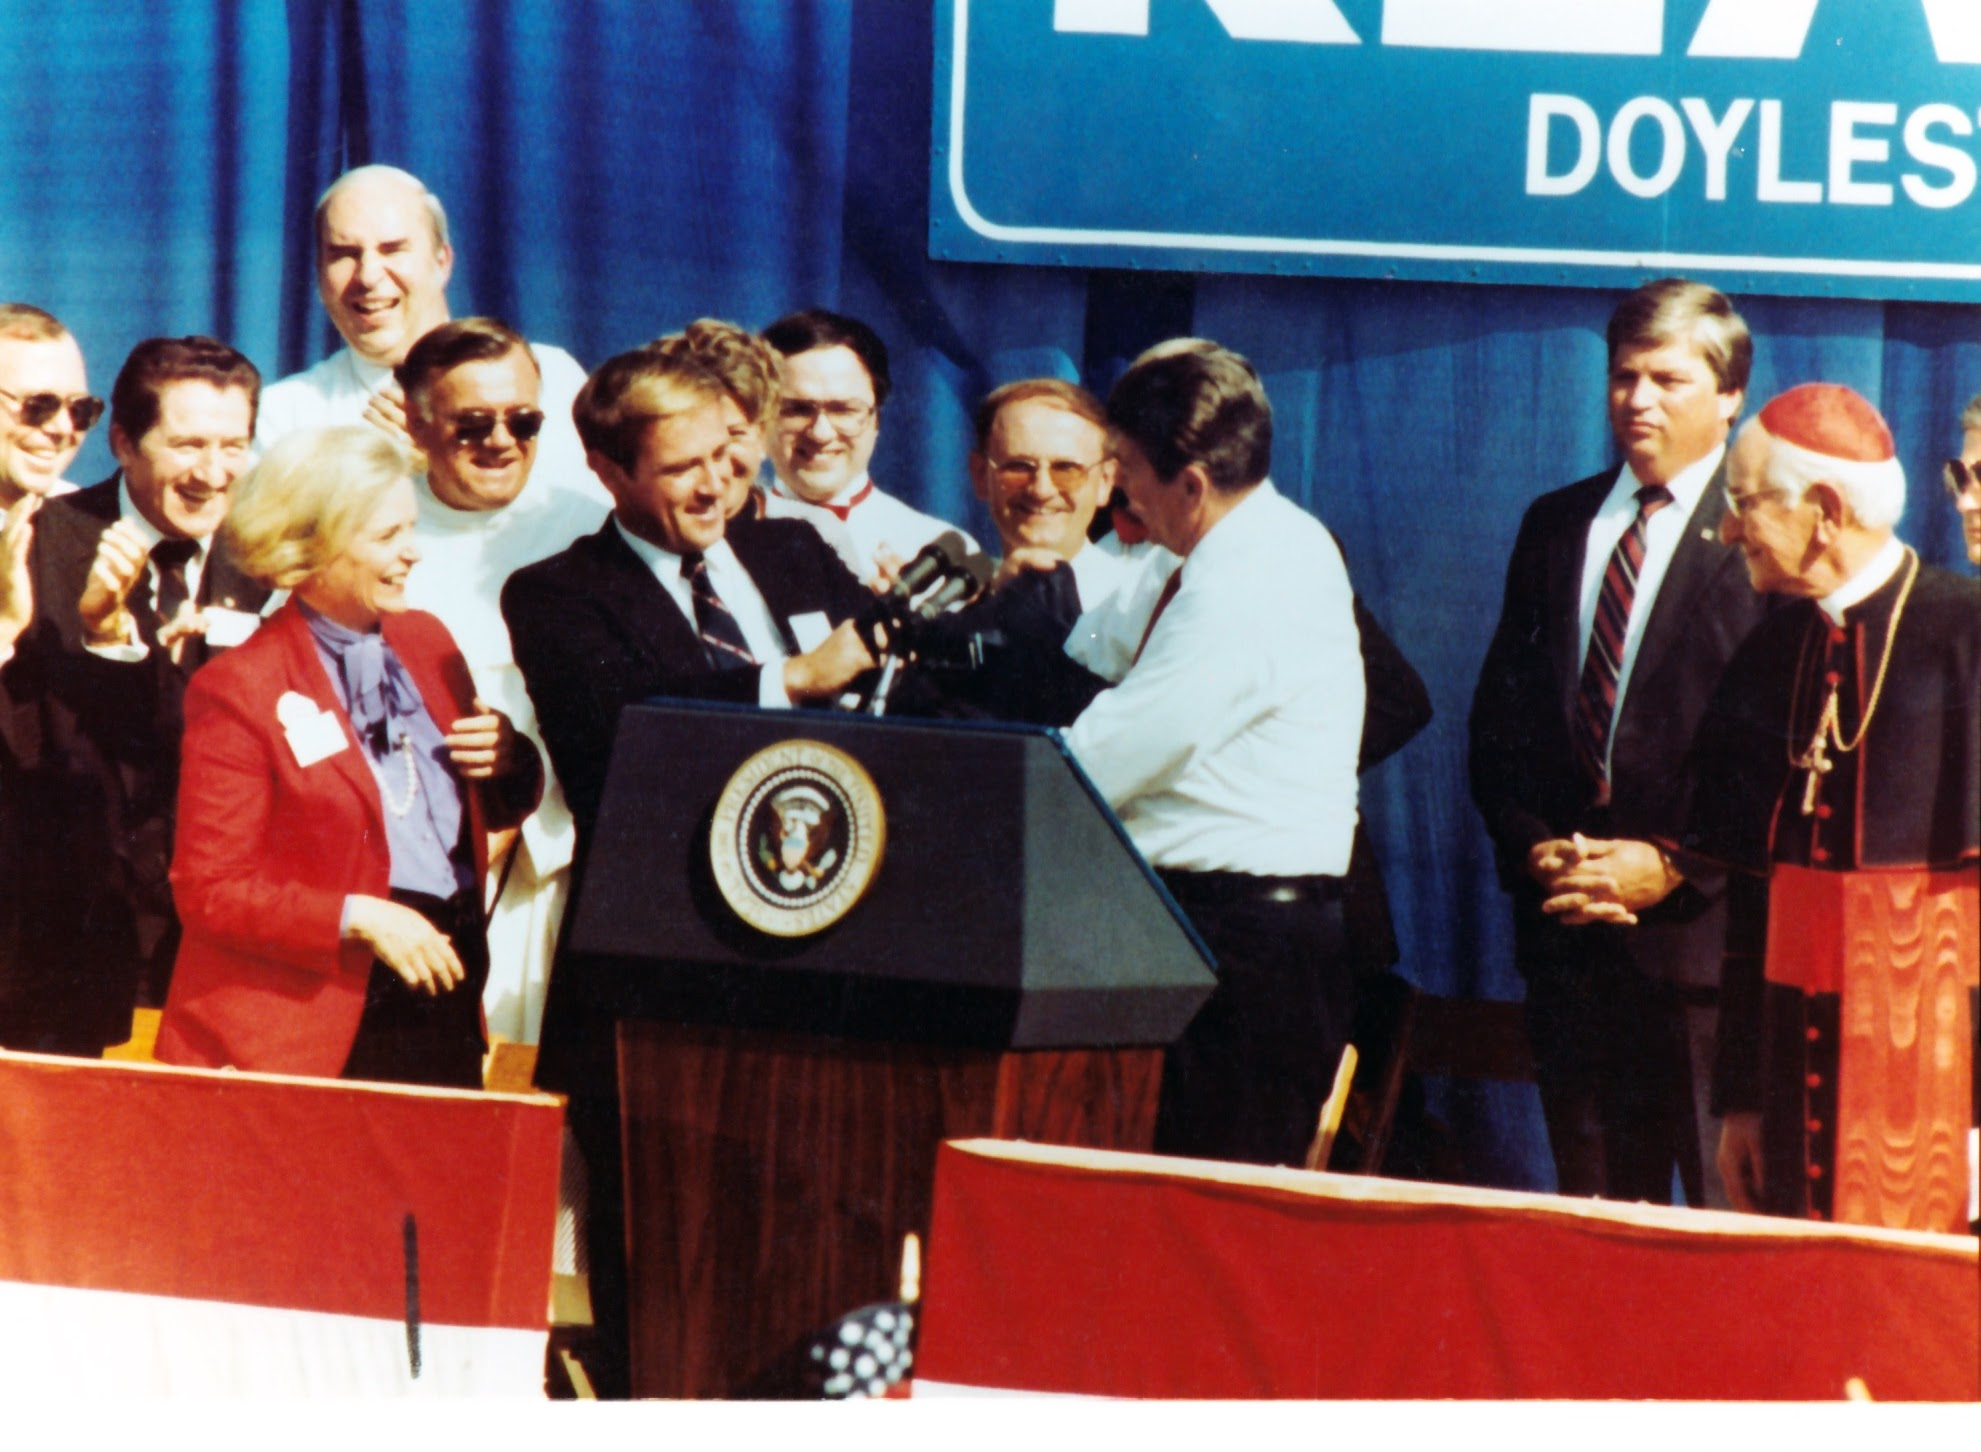 David offers Ronald Reagan his coat